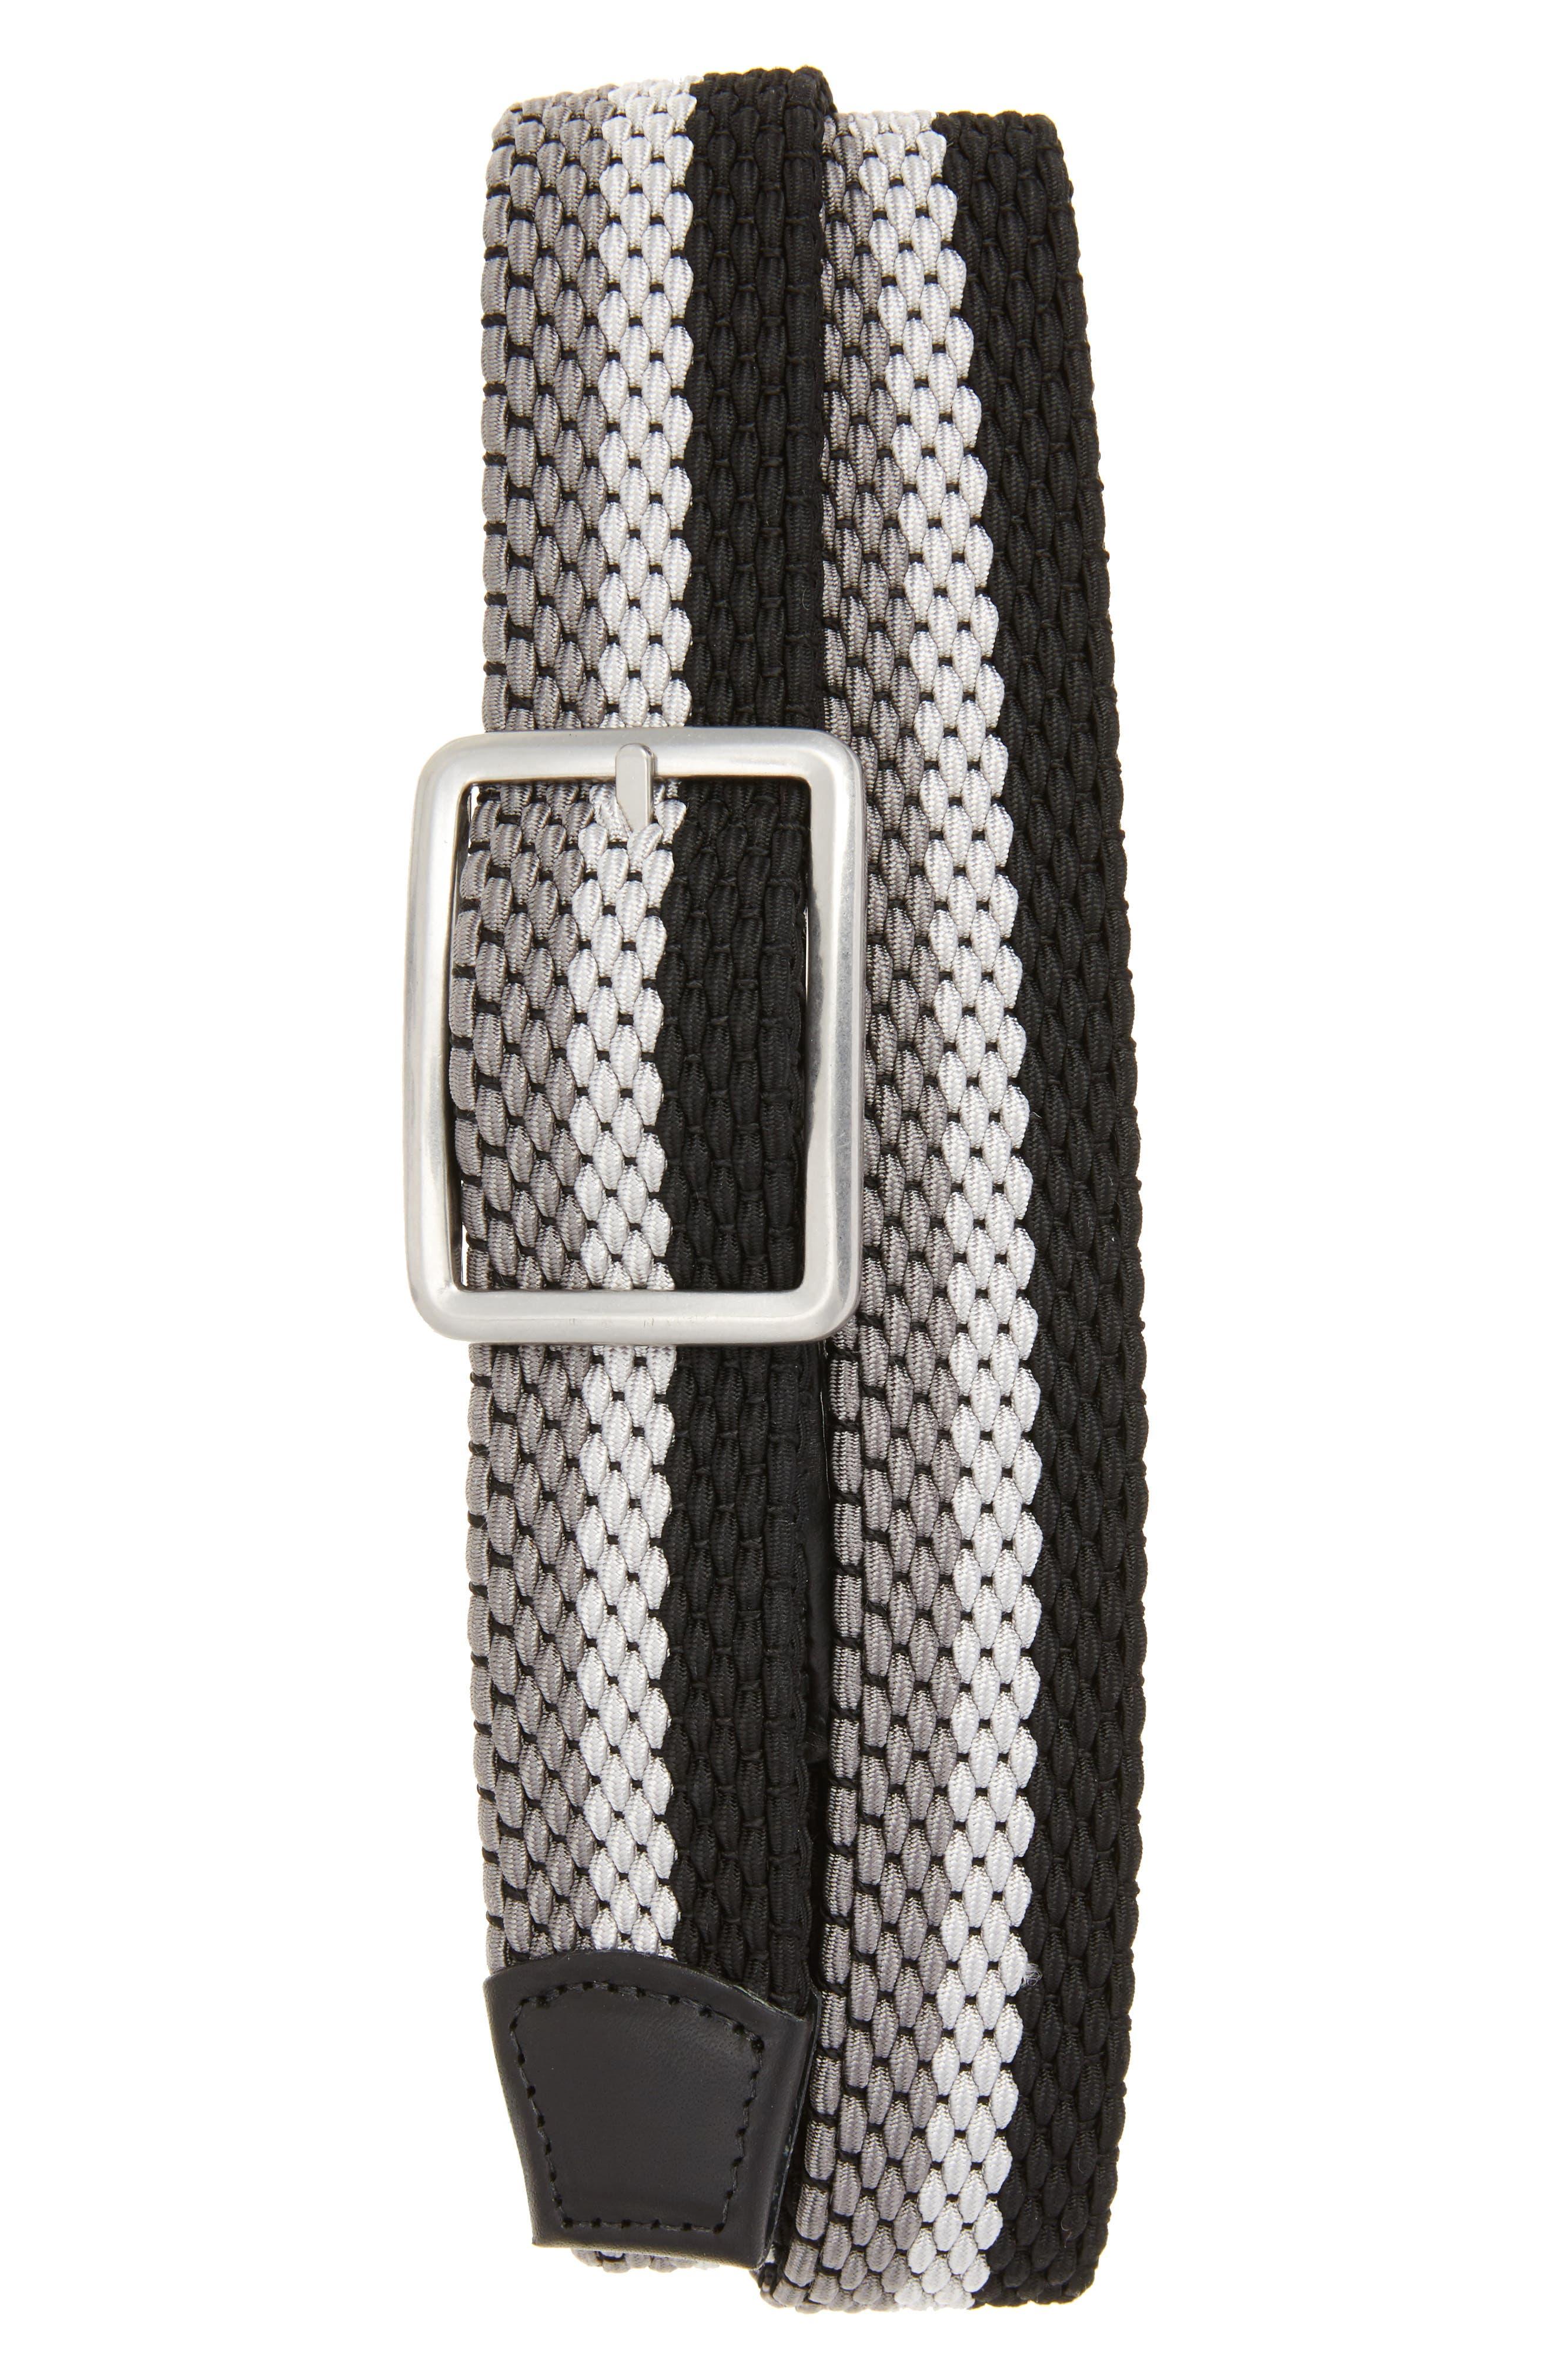 Tri Stripe Reversible Woven Belt,                             Main thumbnail 1, color,                             GREY/ NICKLE/ BLACK